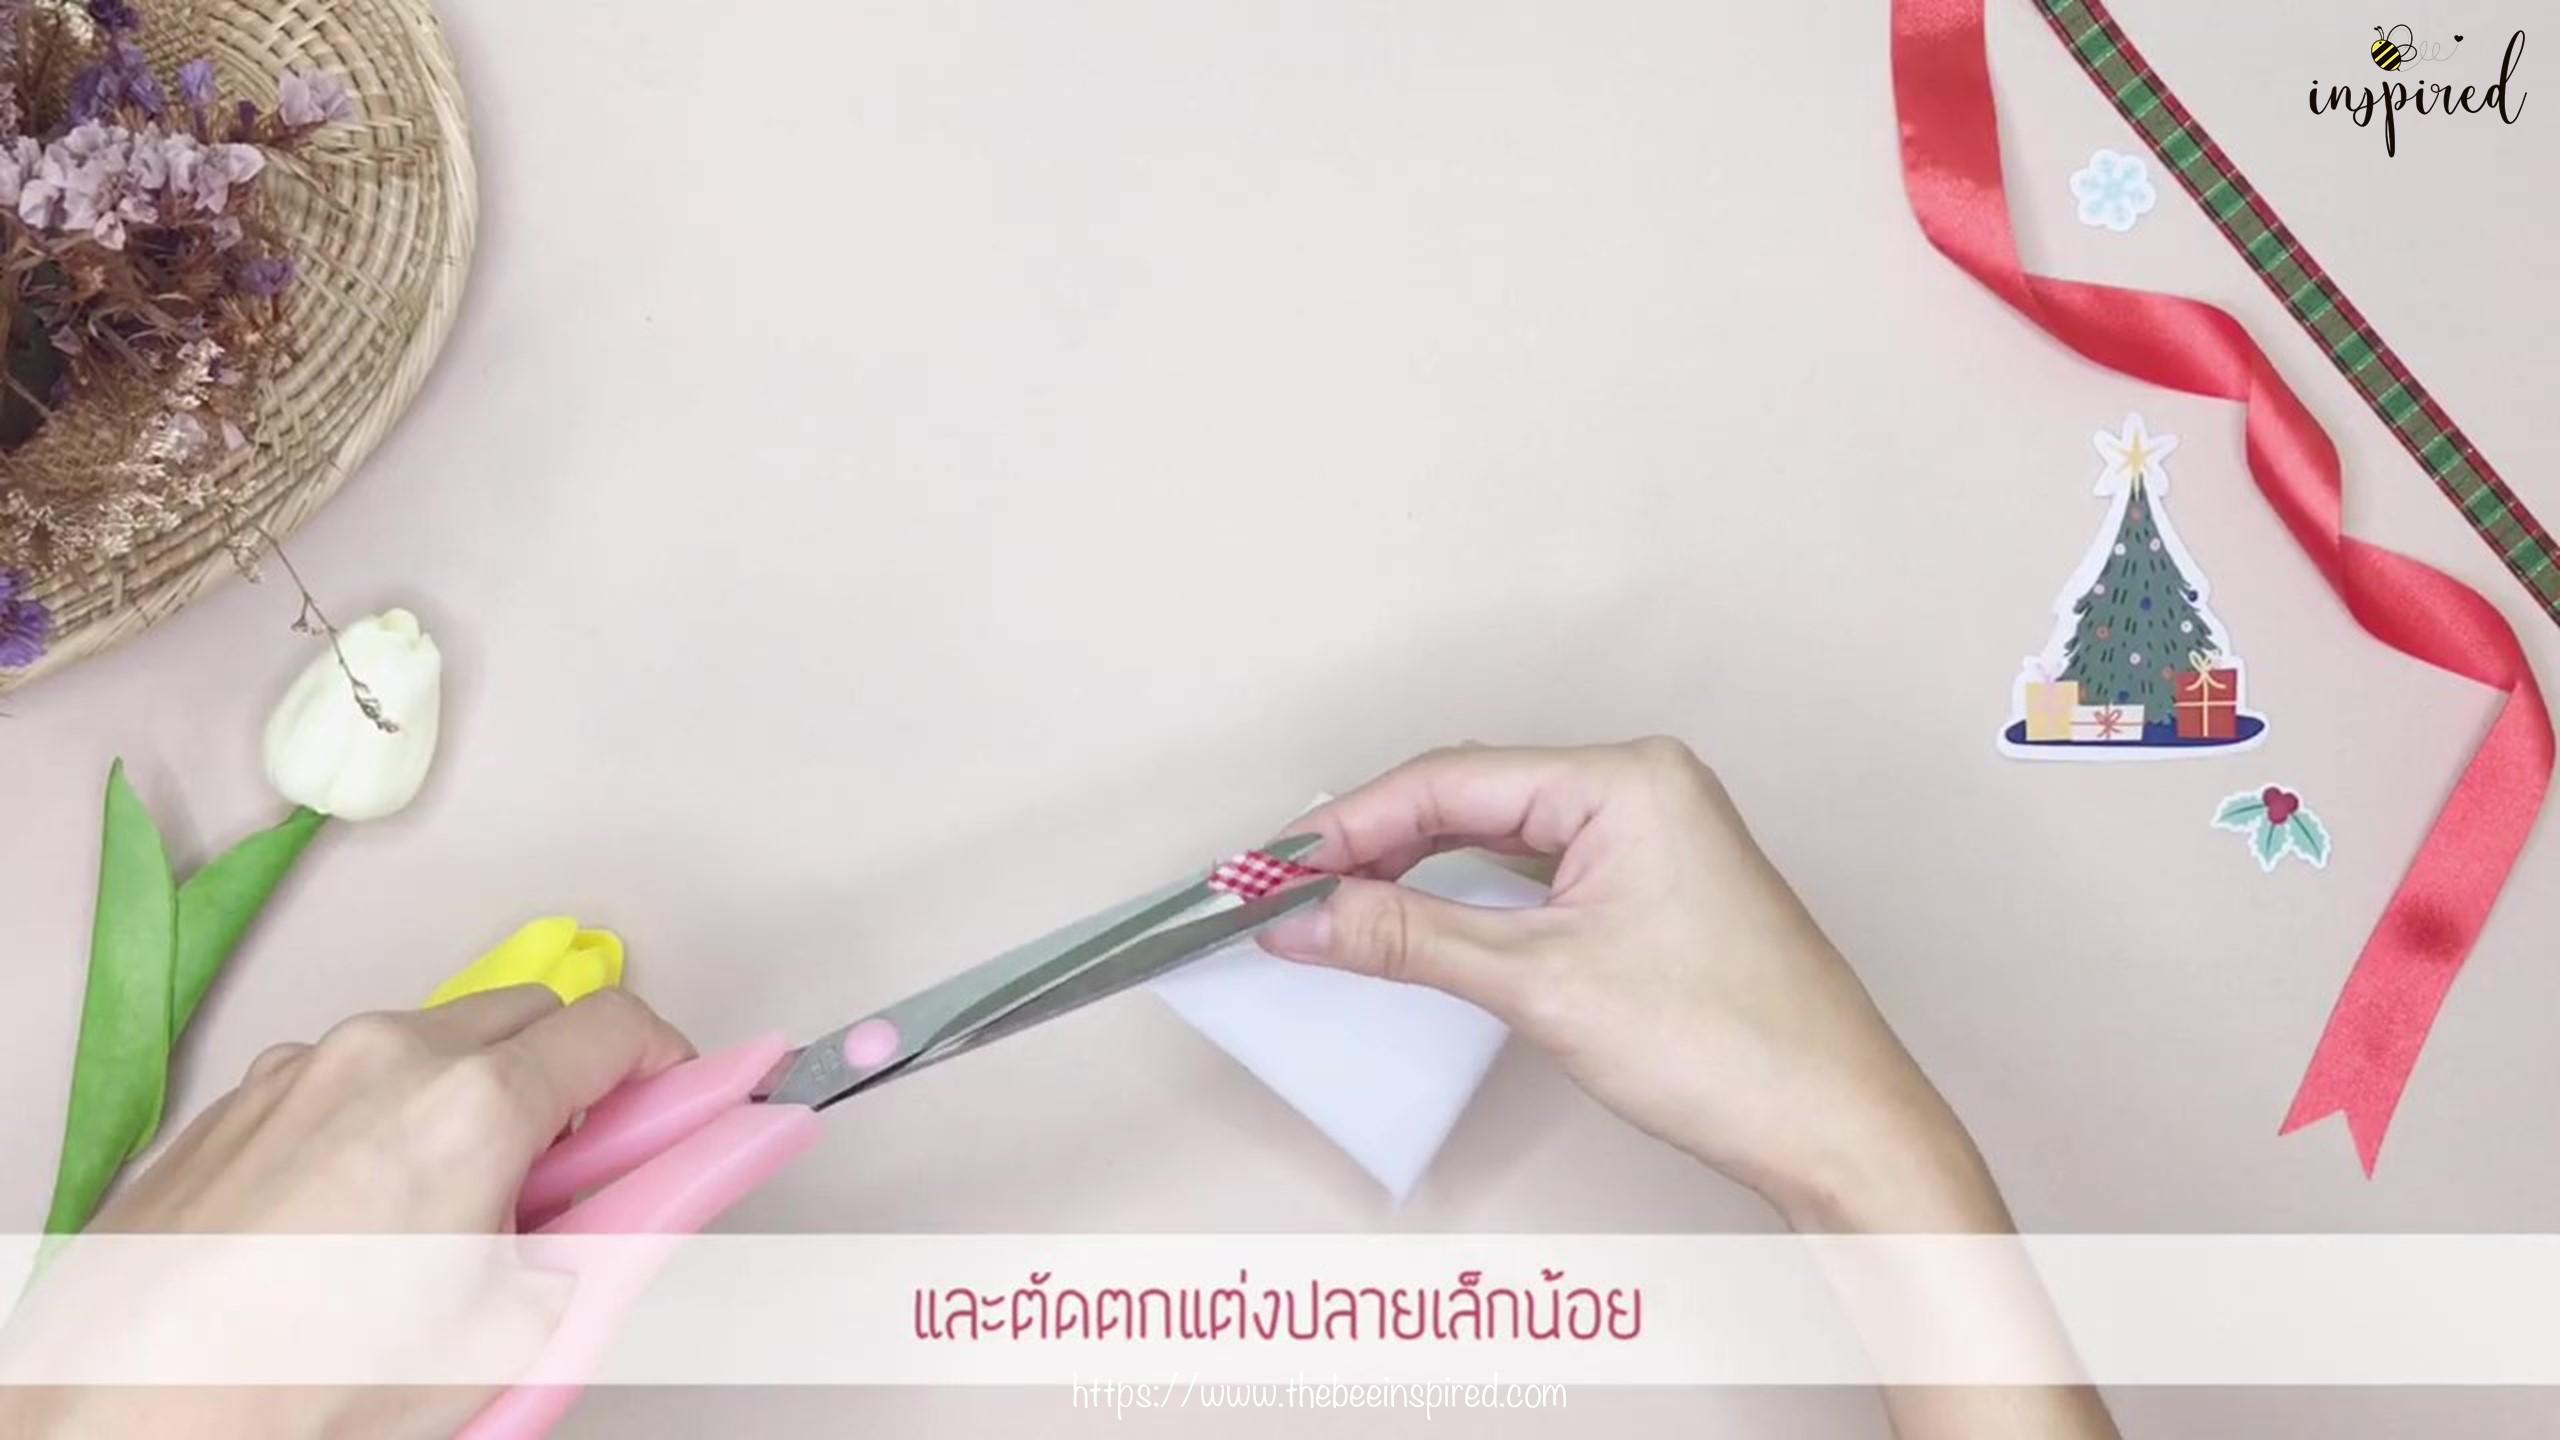 DIY วิธีทำถุงของขวัญวันวาเลนไทน์สามเหลี่ยม_ How to Wrap Gift in Triangle Shape for Valentine_13